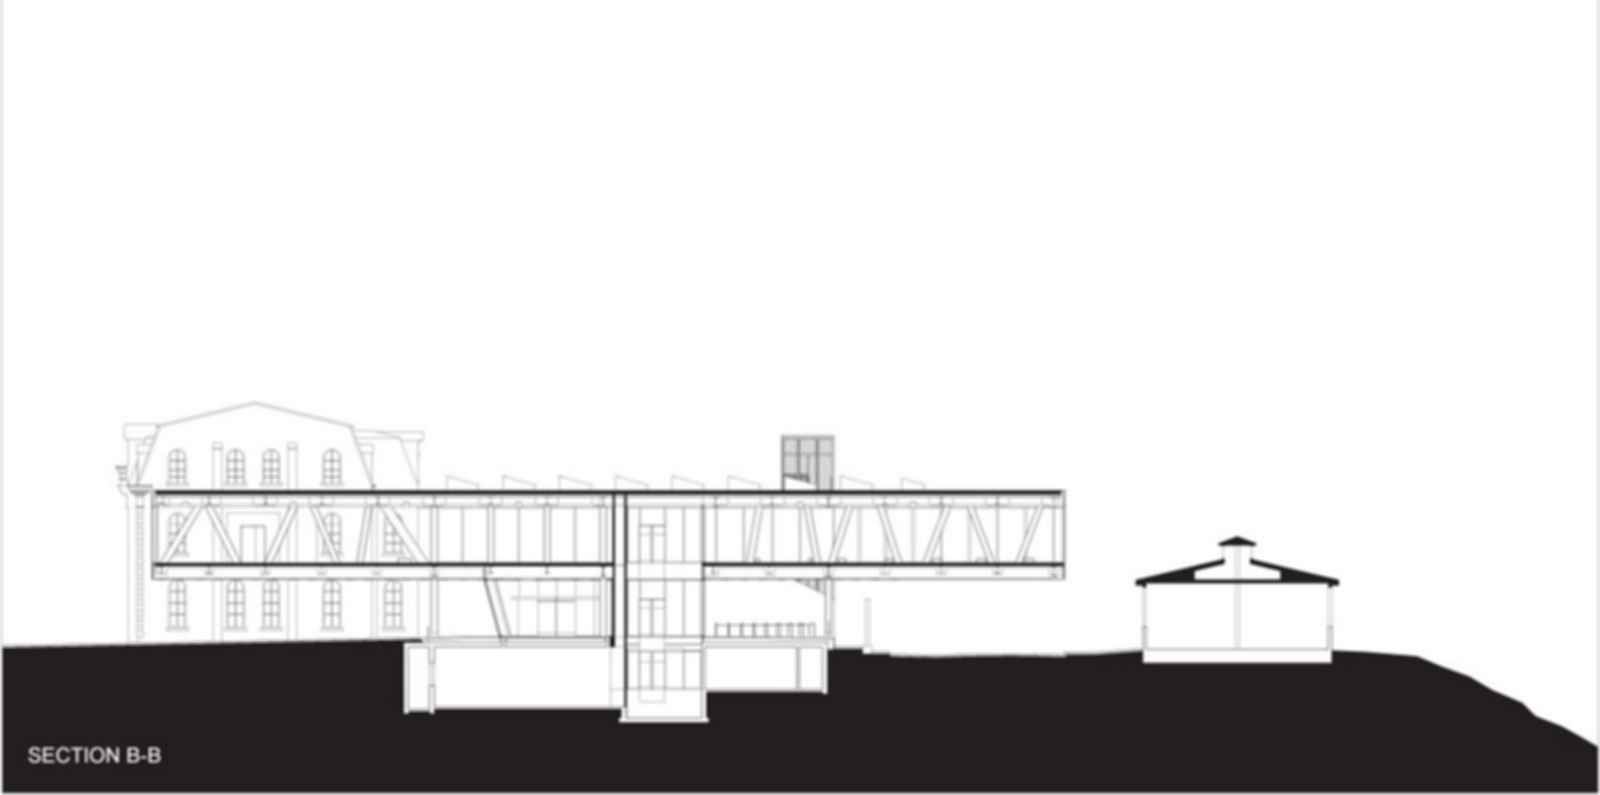 Milstein Hall at Cornell University - Concept Design